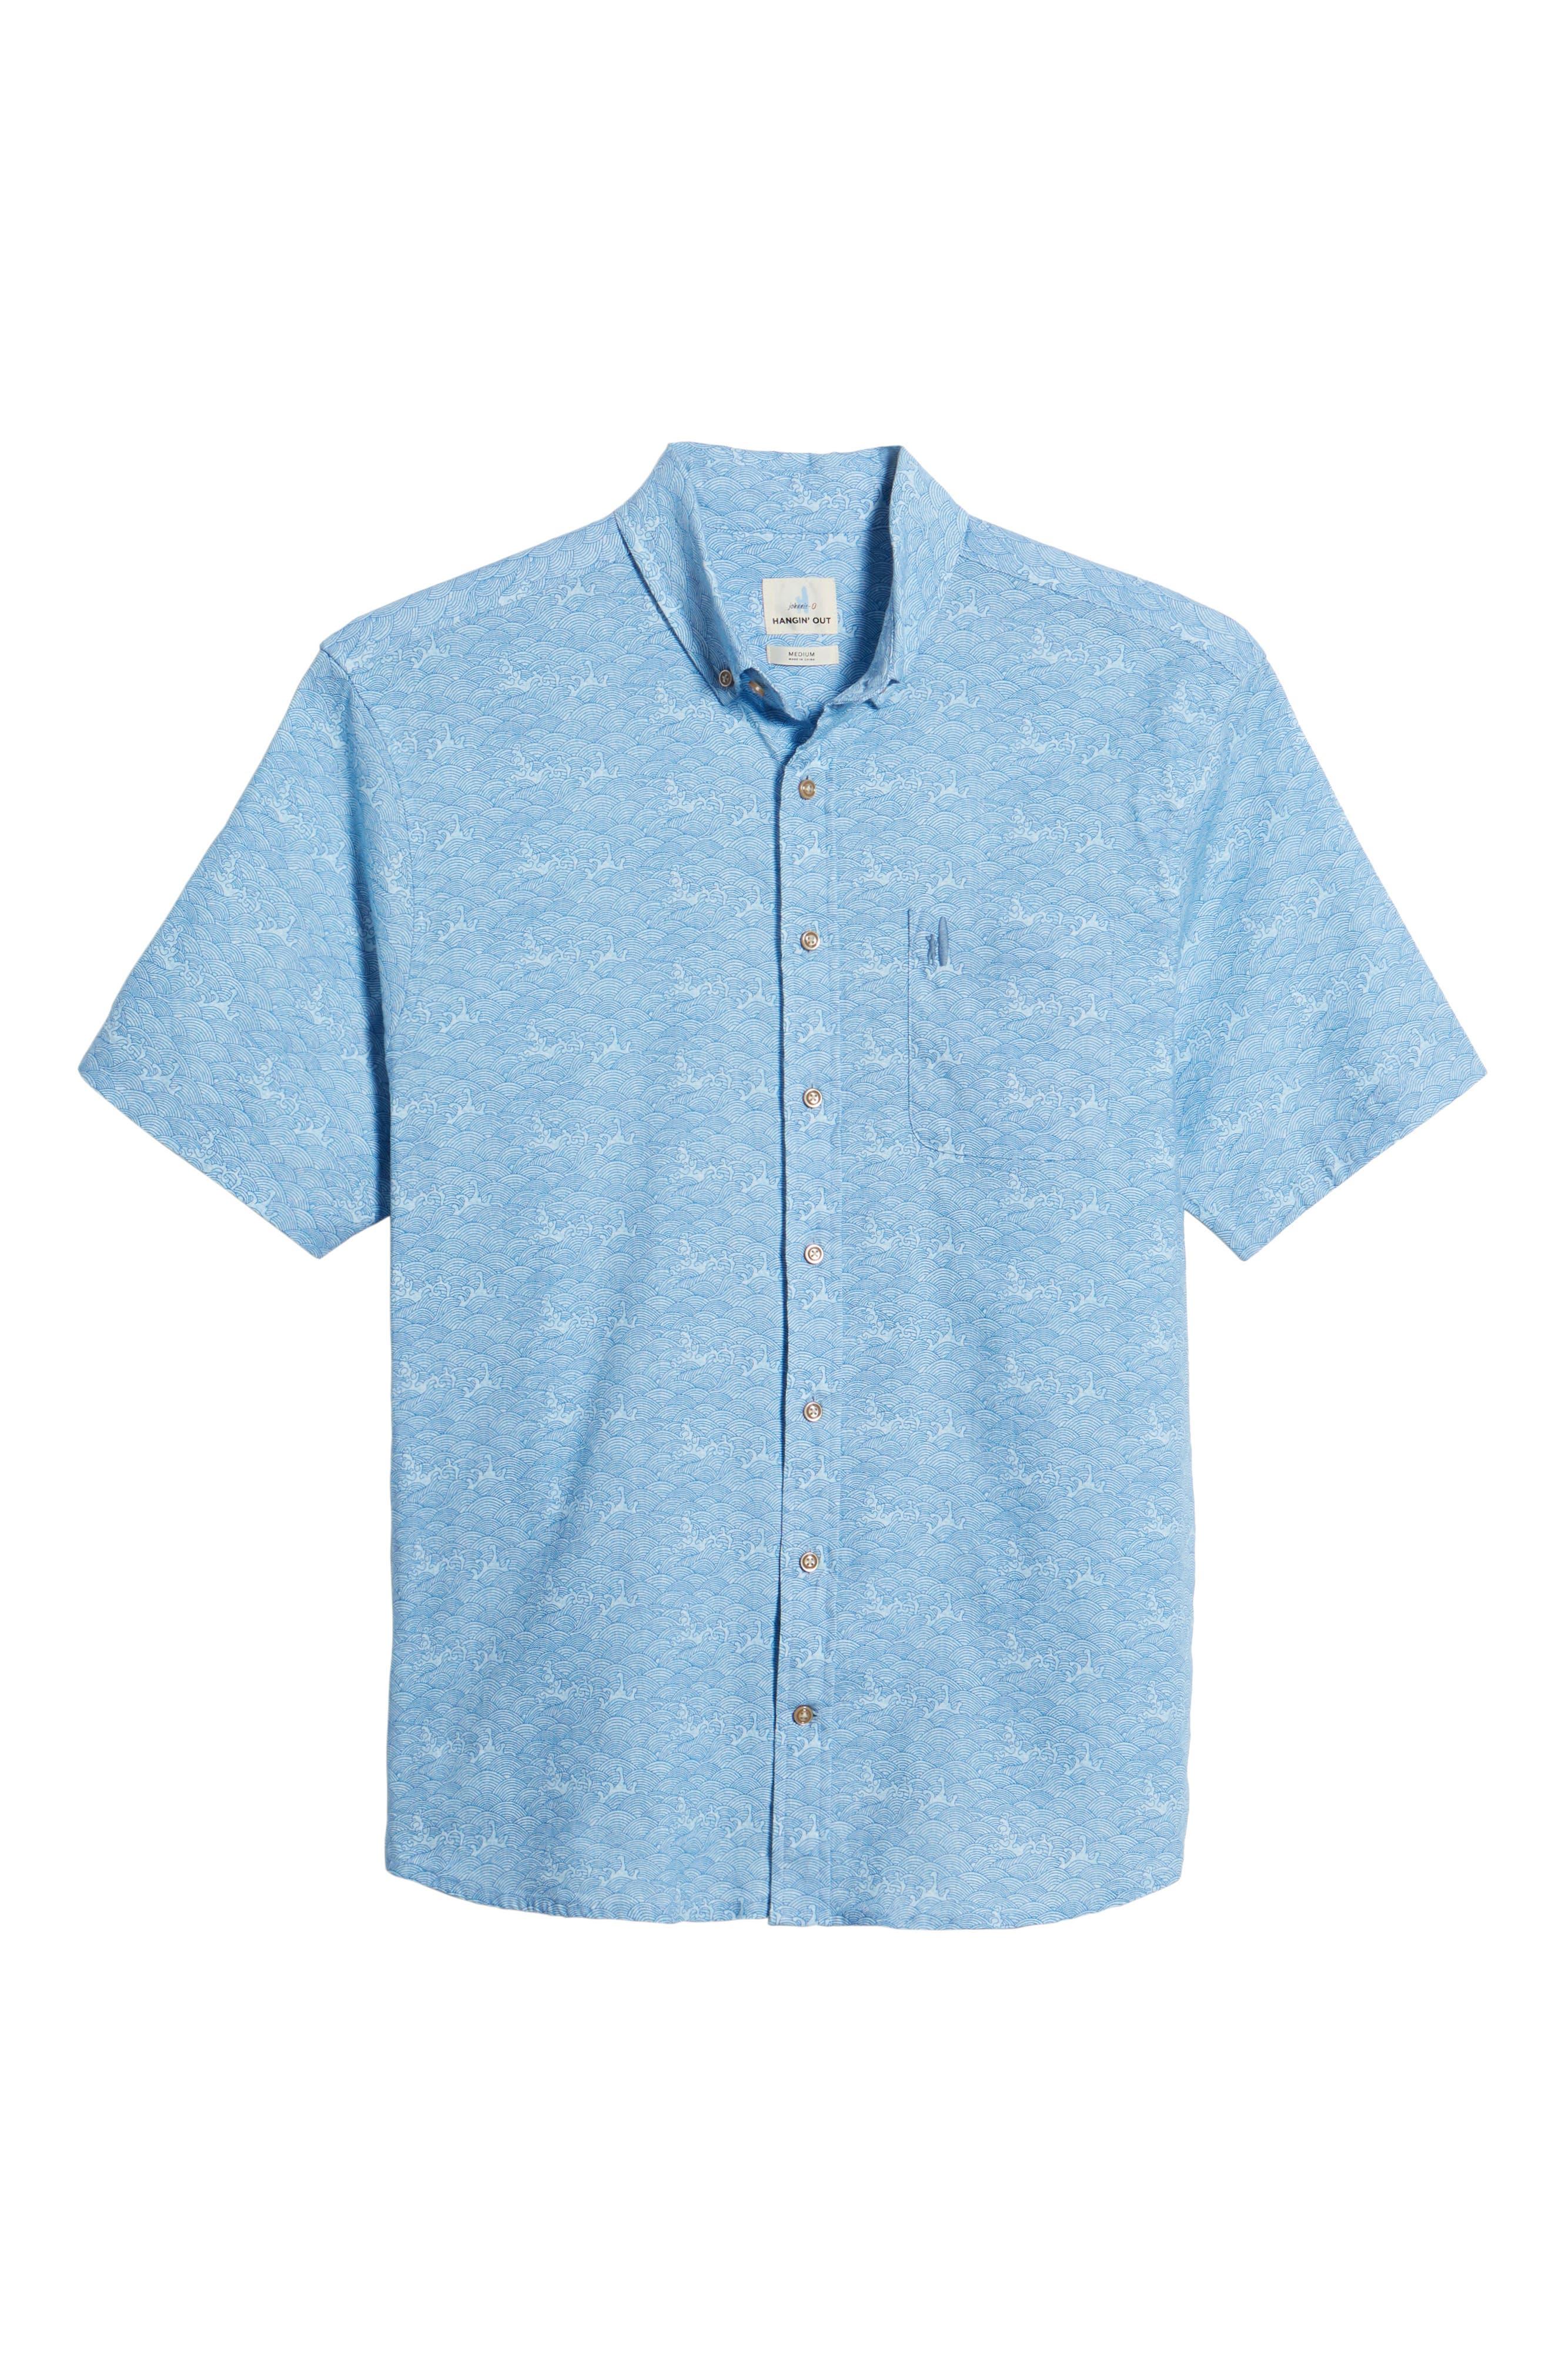 Cole Regular Fit Sport Shirt,                             Alternate thumbnail 6, color,                             347